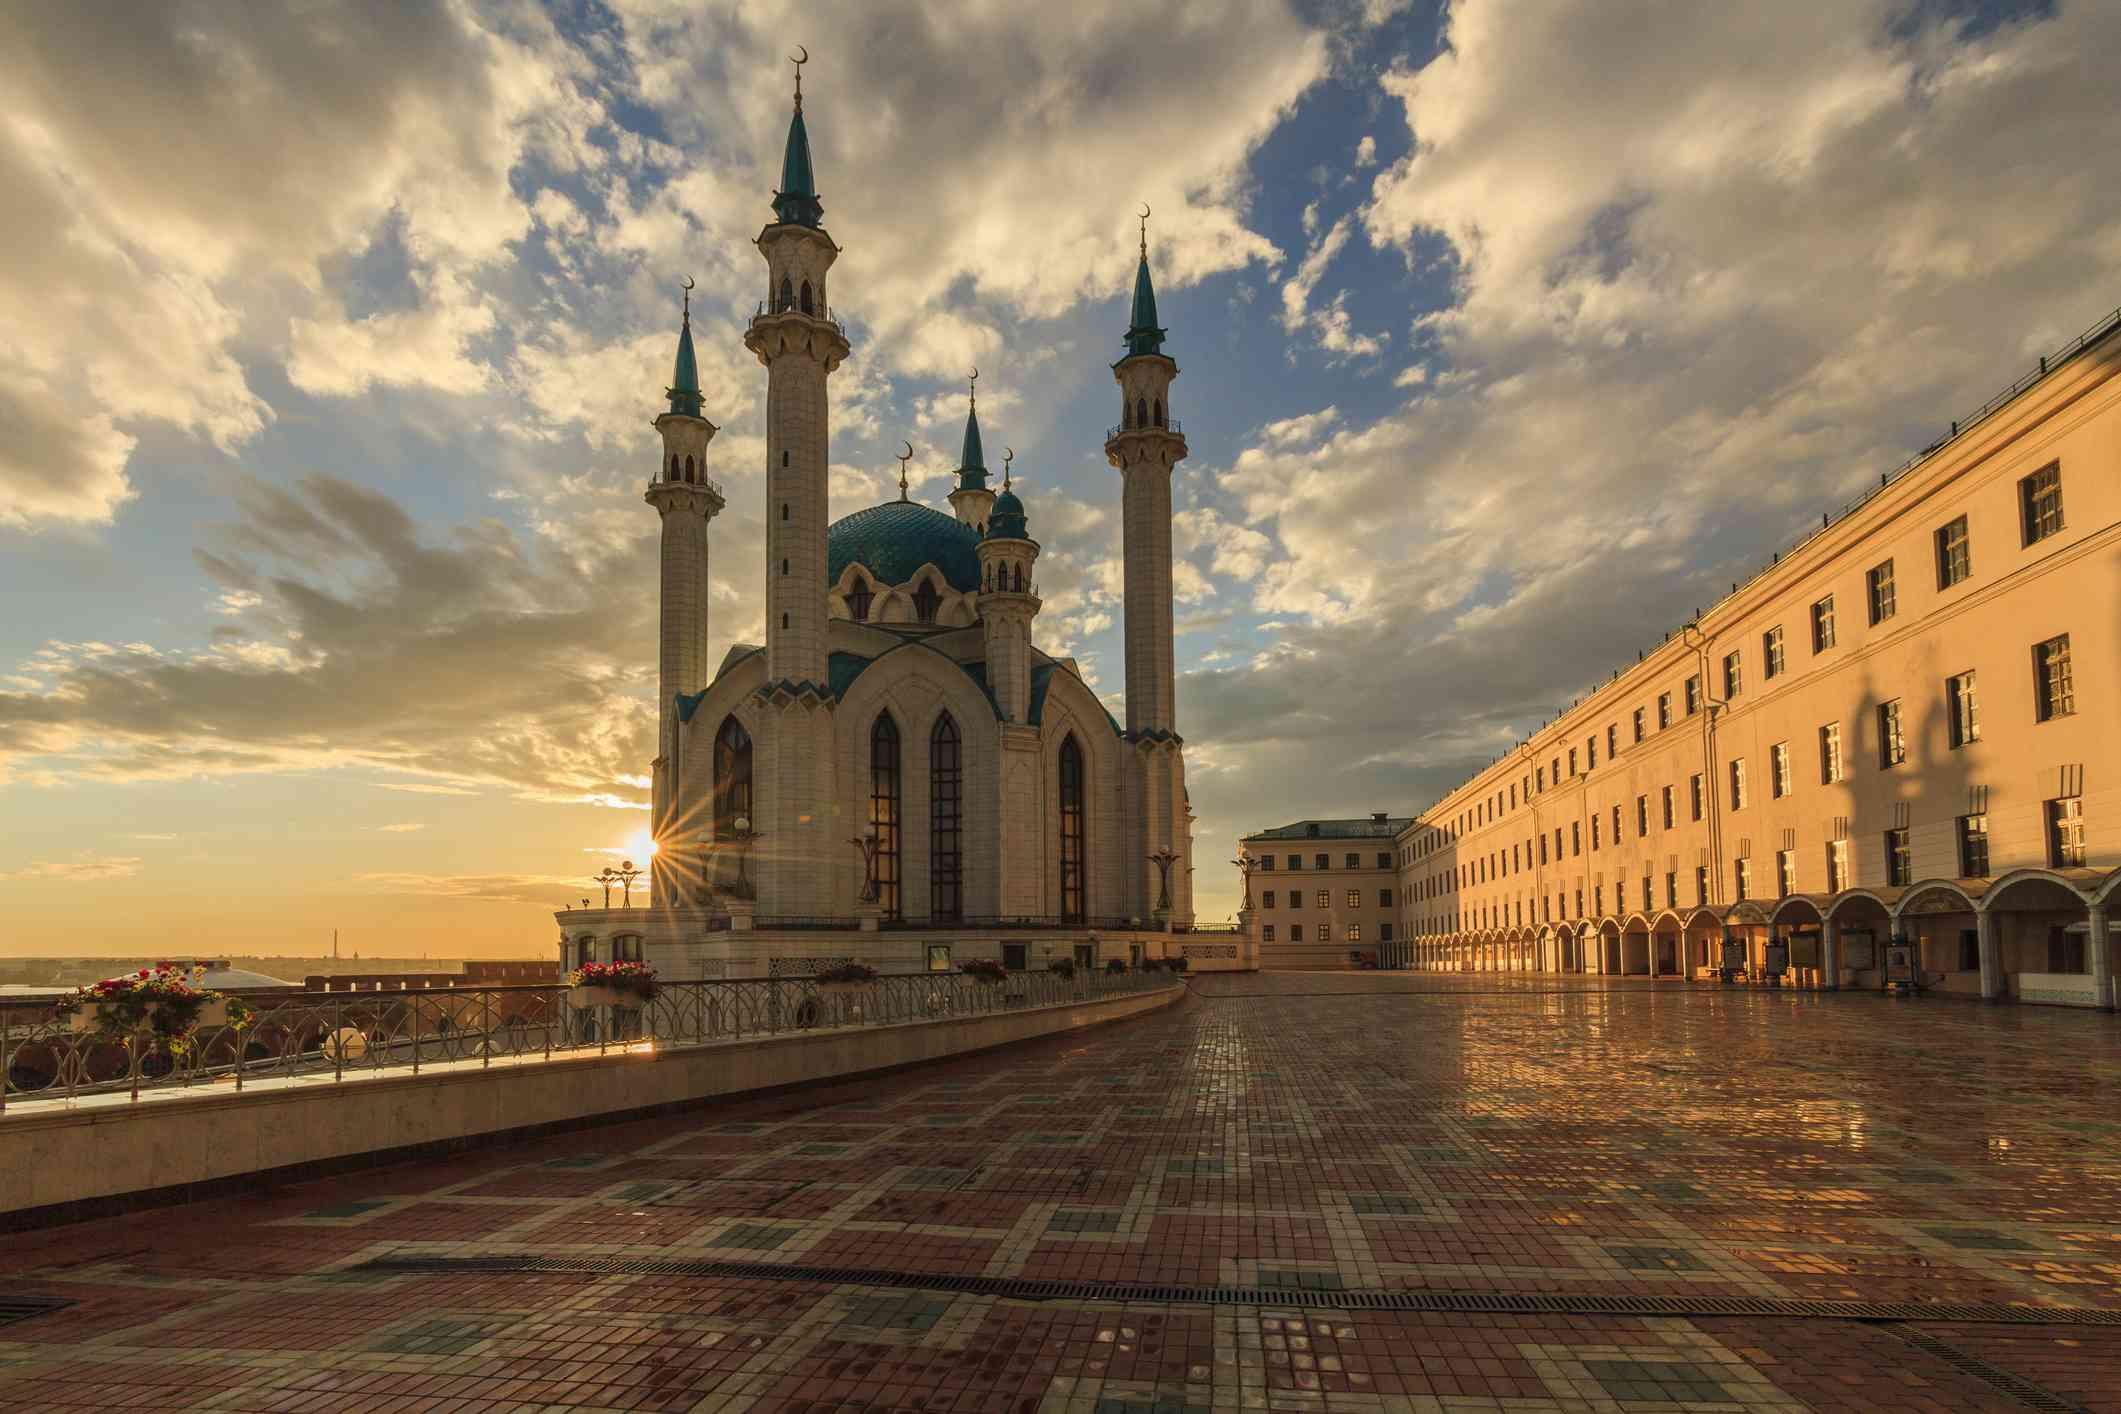 Kul Sharif Mosque in Kazan Kremlin at sunset